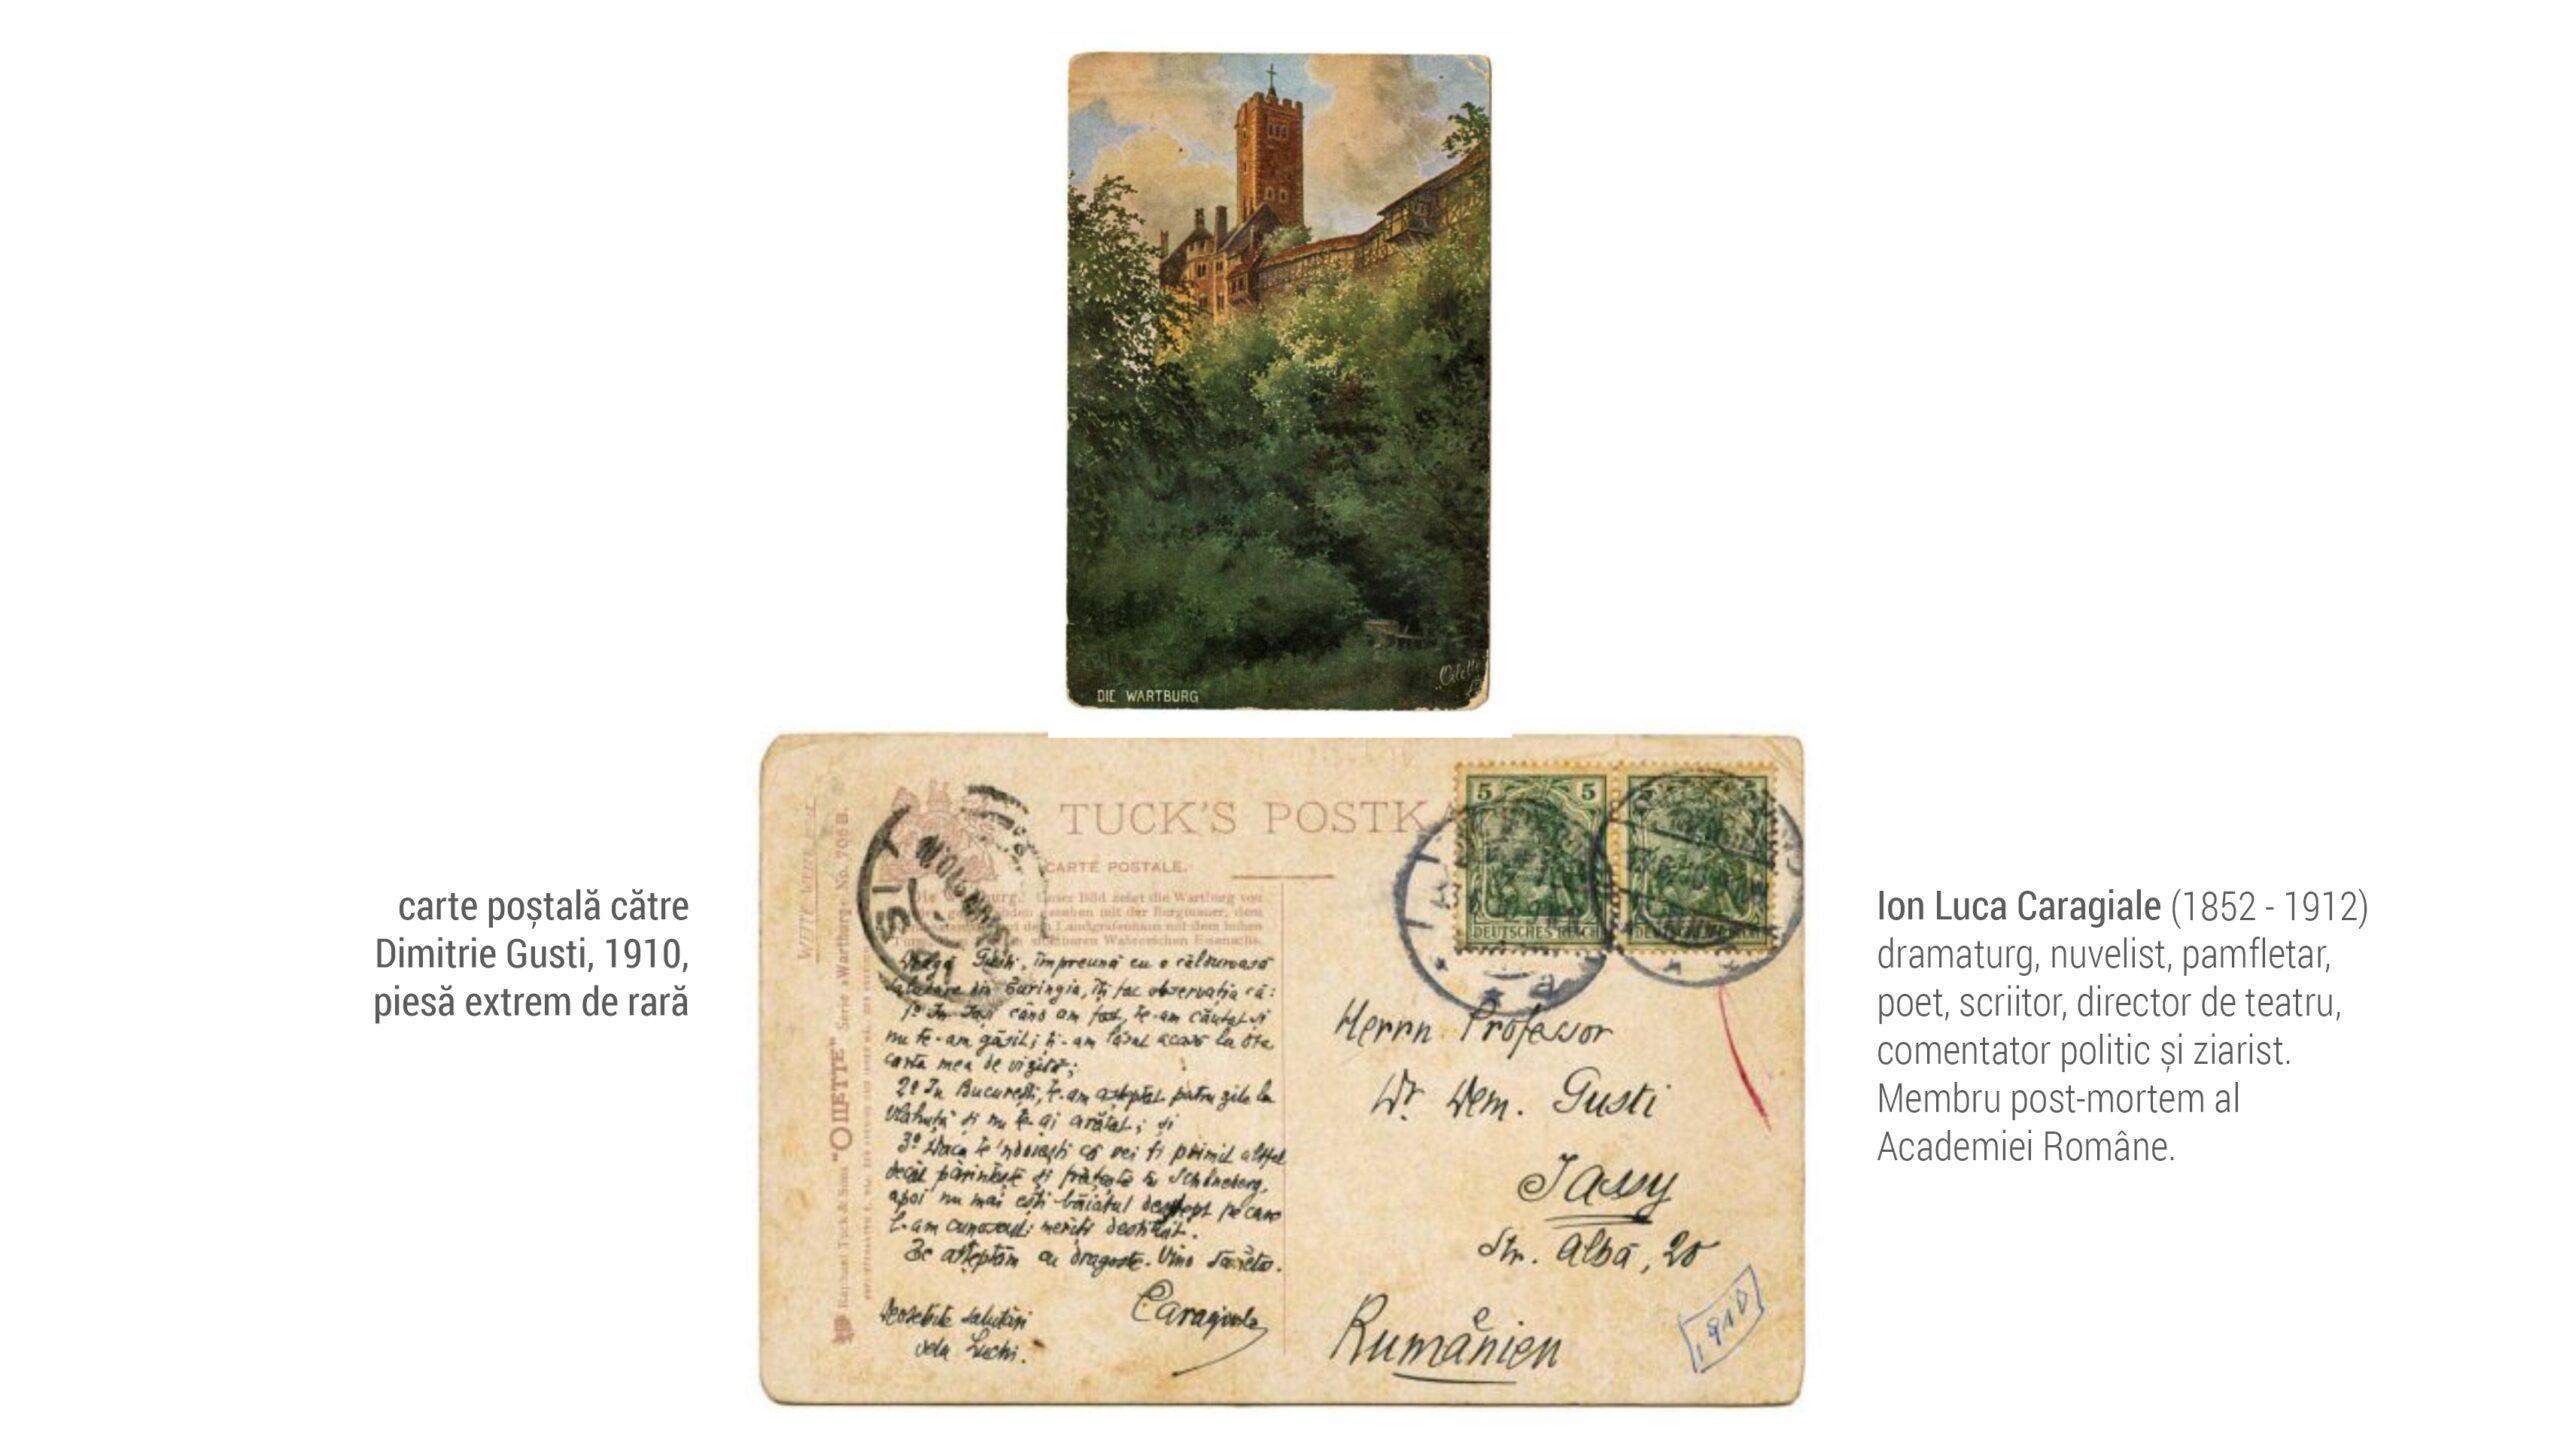 1910 Caragiale - carte postala D Gusti